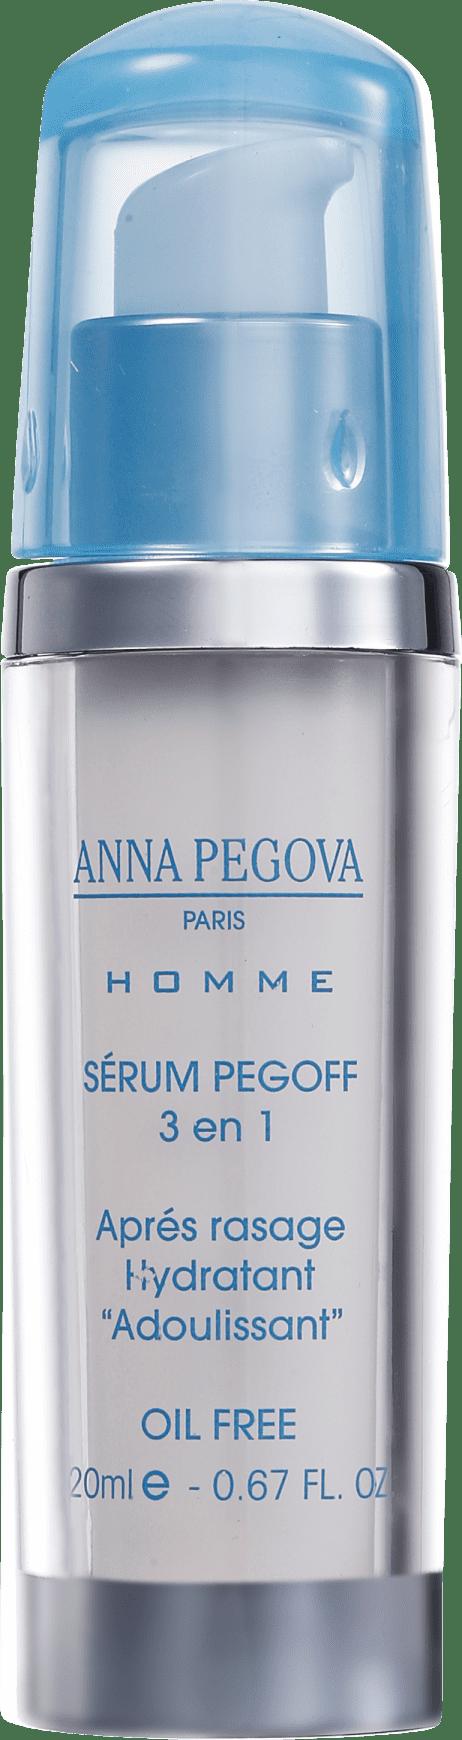 0f7aefc1783c3 Anna Pegova Homme Pegoff 3 En 1 - Sérum Pós-Barba Anti-Idade 20ml